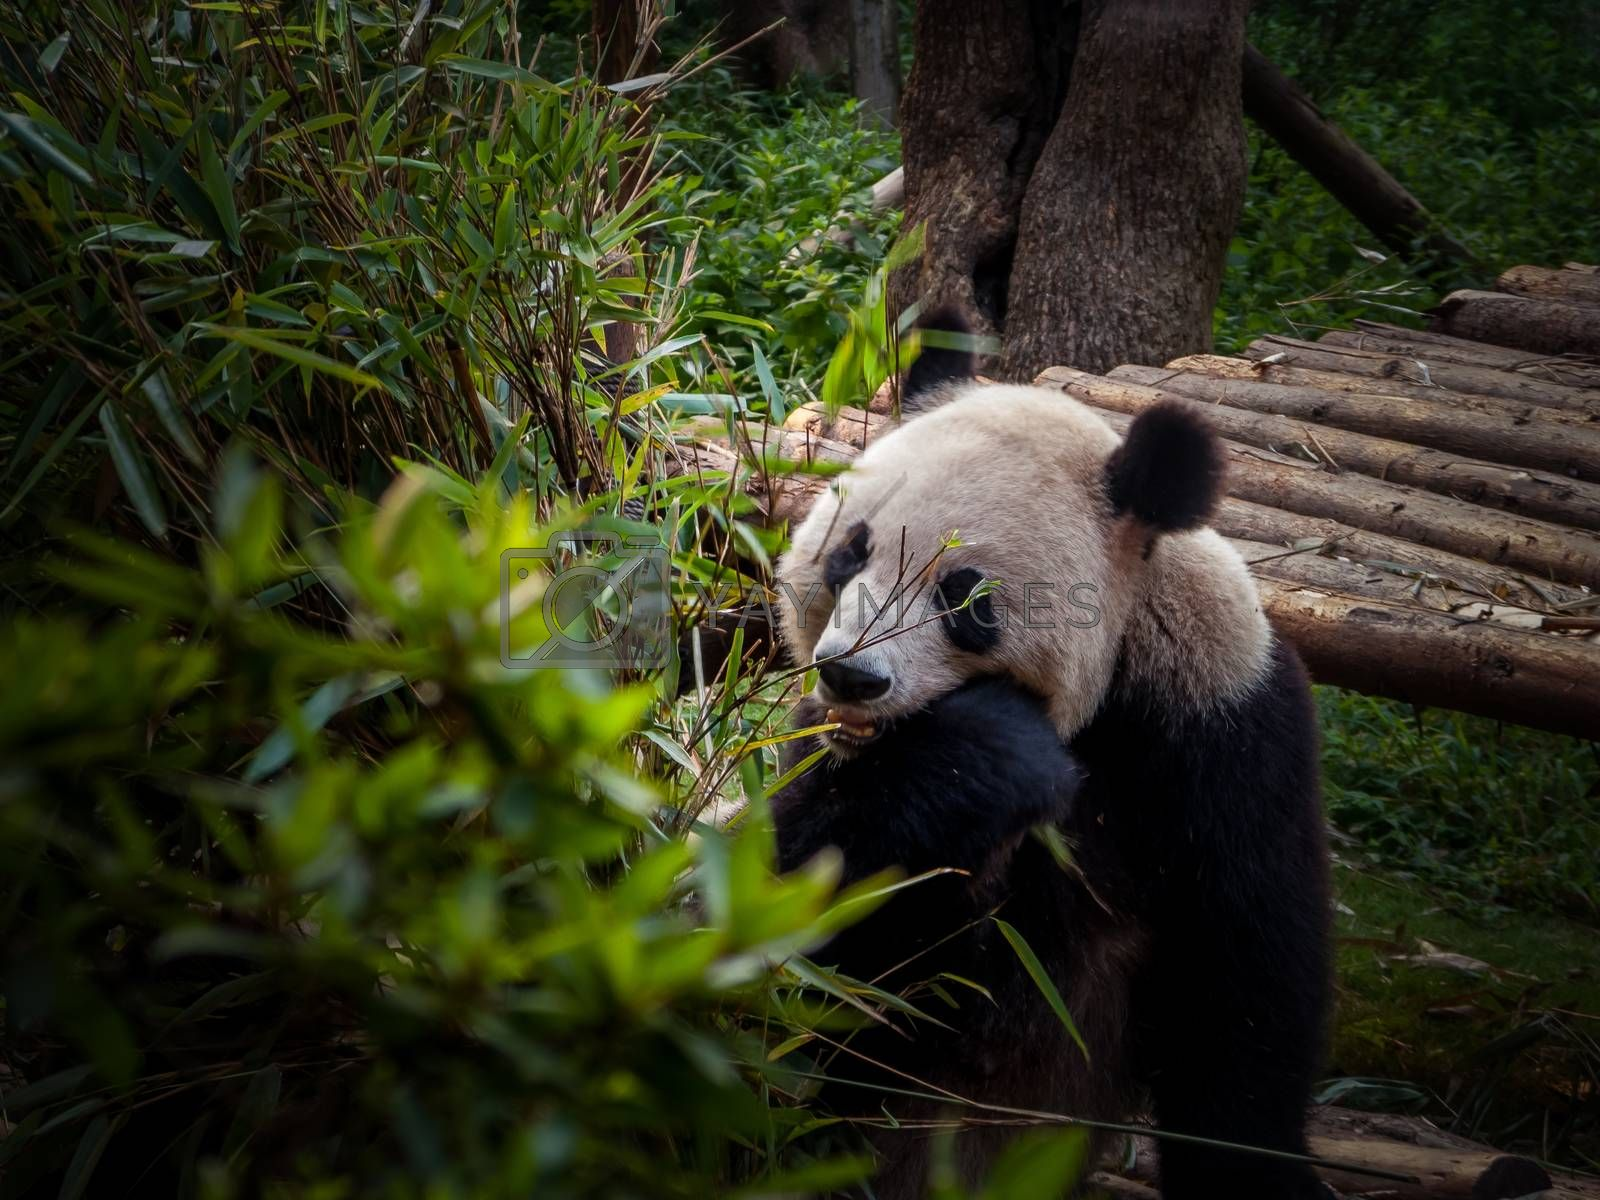 Royalty free image of Panda Chengdu by bamboome